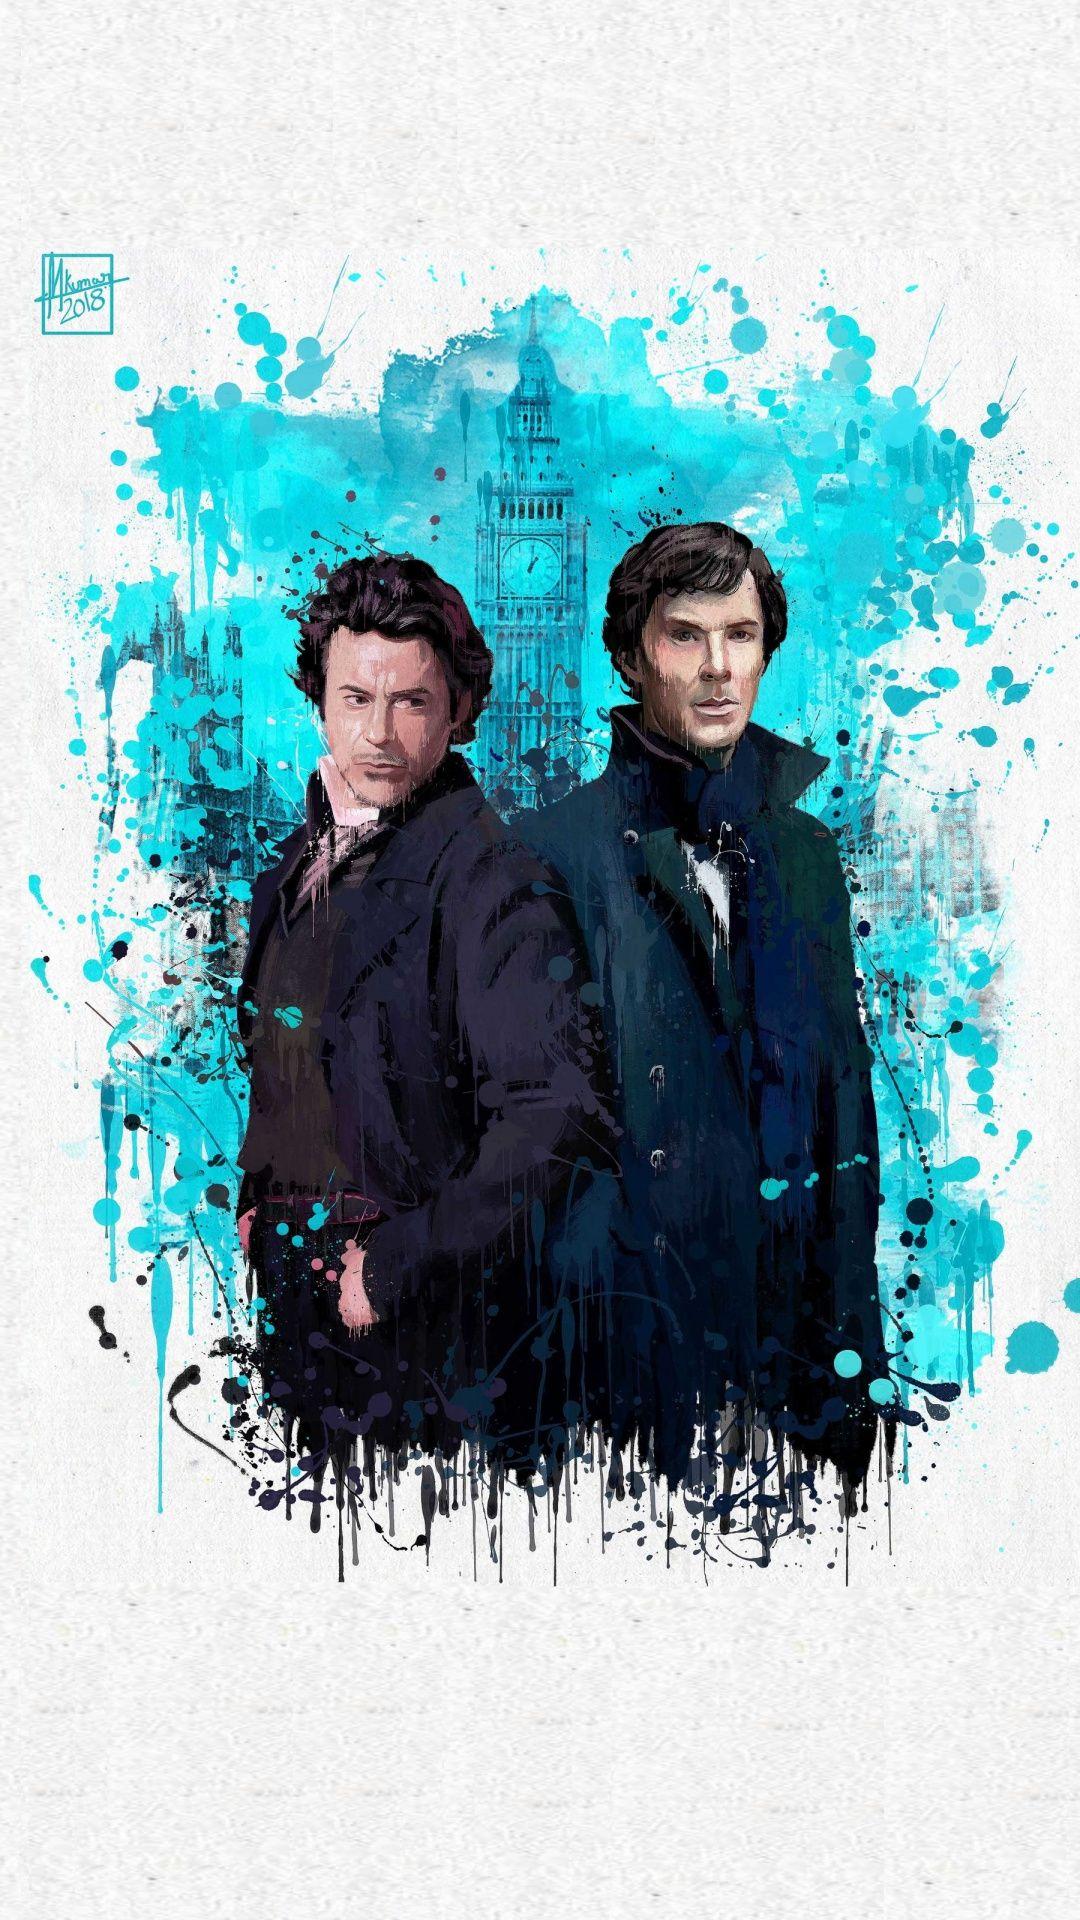 Sherlocks Holmes Benedict Cumberbatch Robert Downey Jr Splash Art Wallpaper Robert Downey Jr Vingadores Filmes